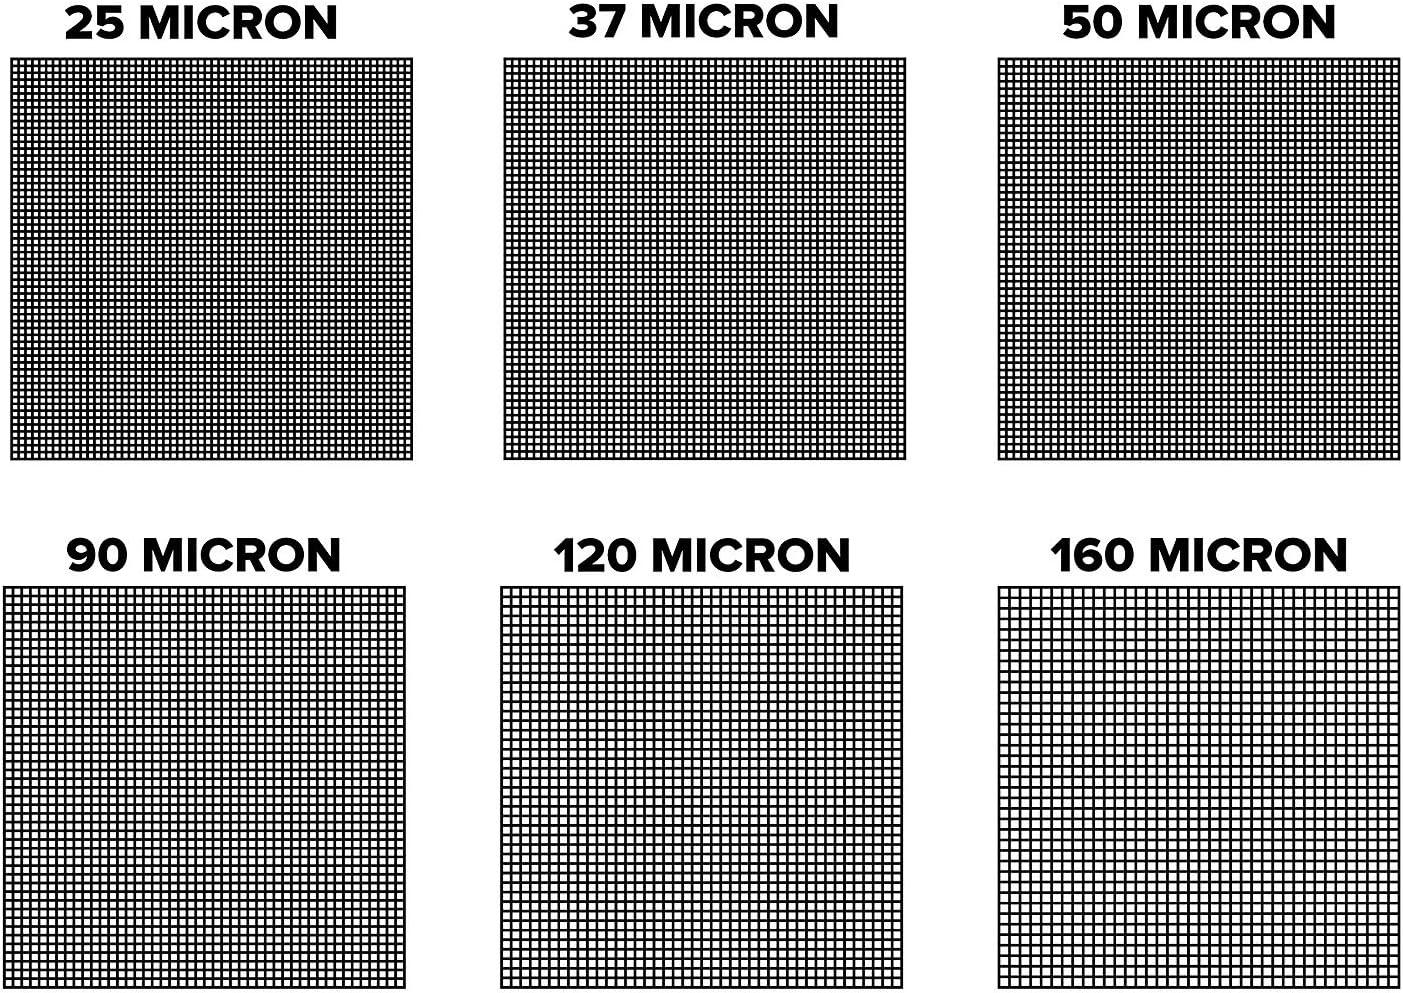 Premium Nylon Tea Filter Press Screen Bags 15 Micron Zero Blowout Guarantee 20 Pack 2 x 4 All Micron /& Sizes Available